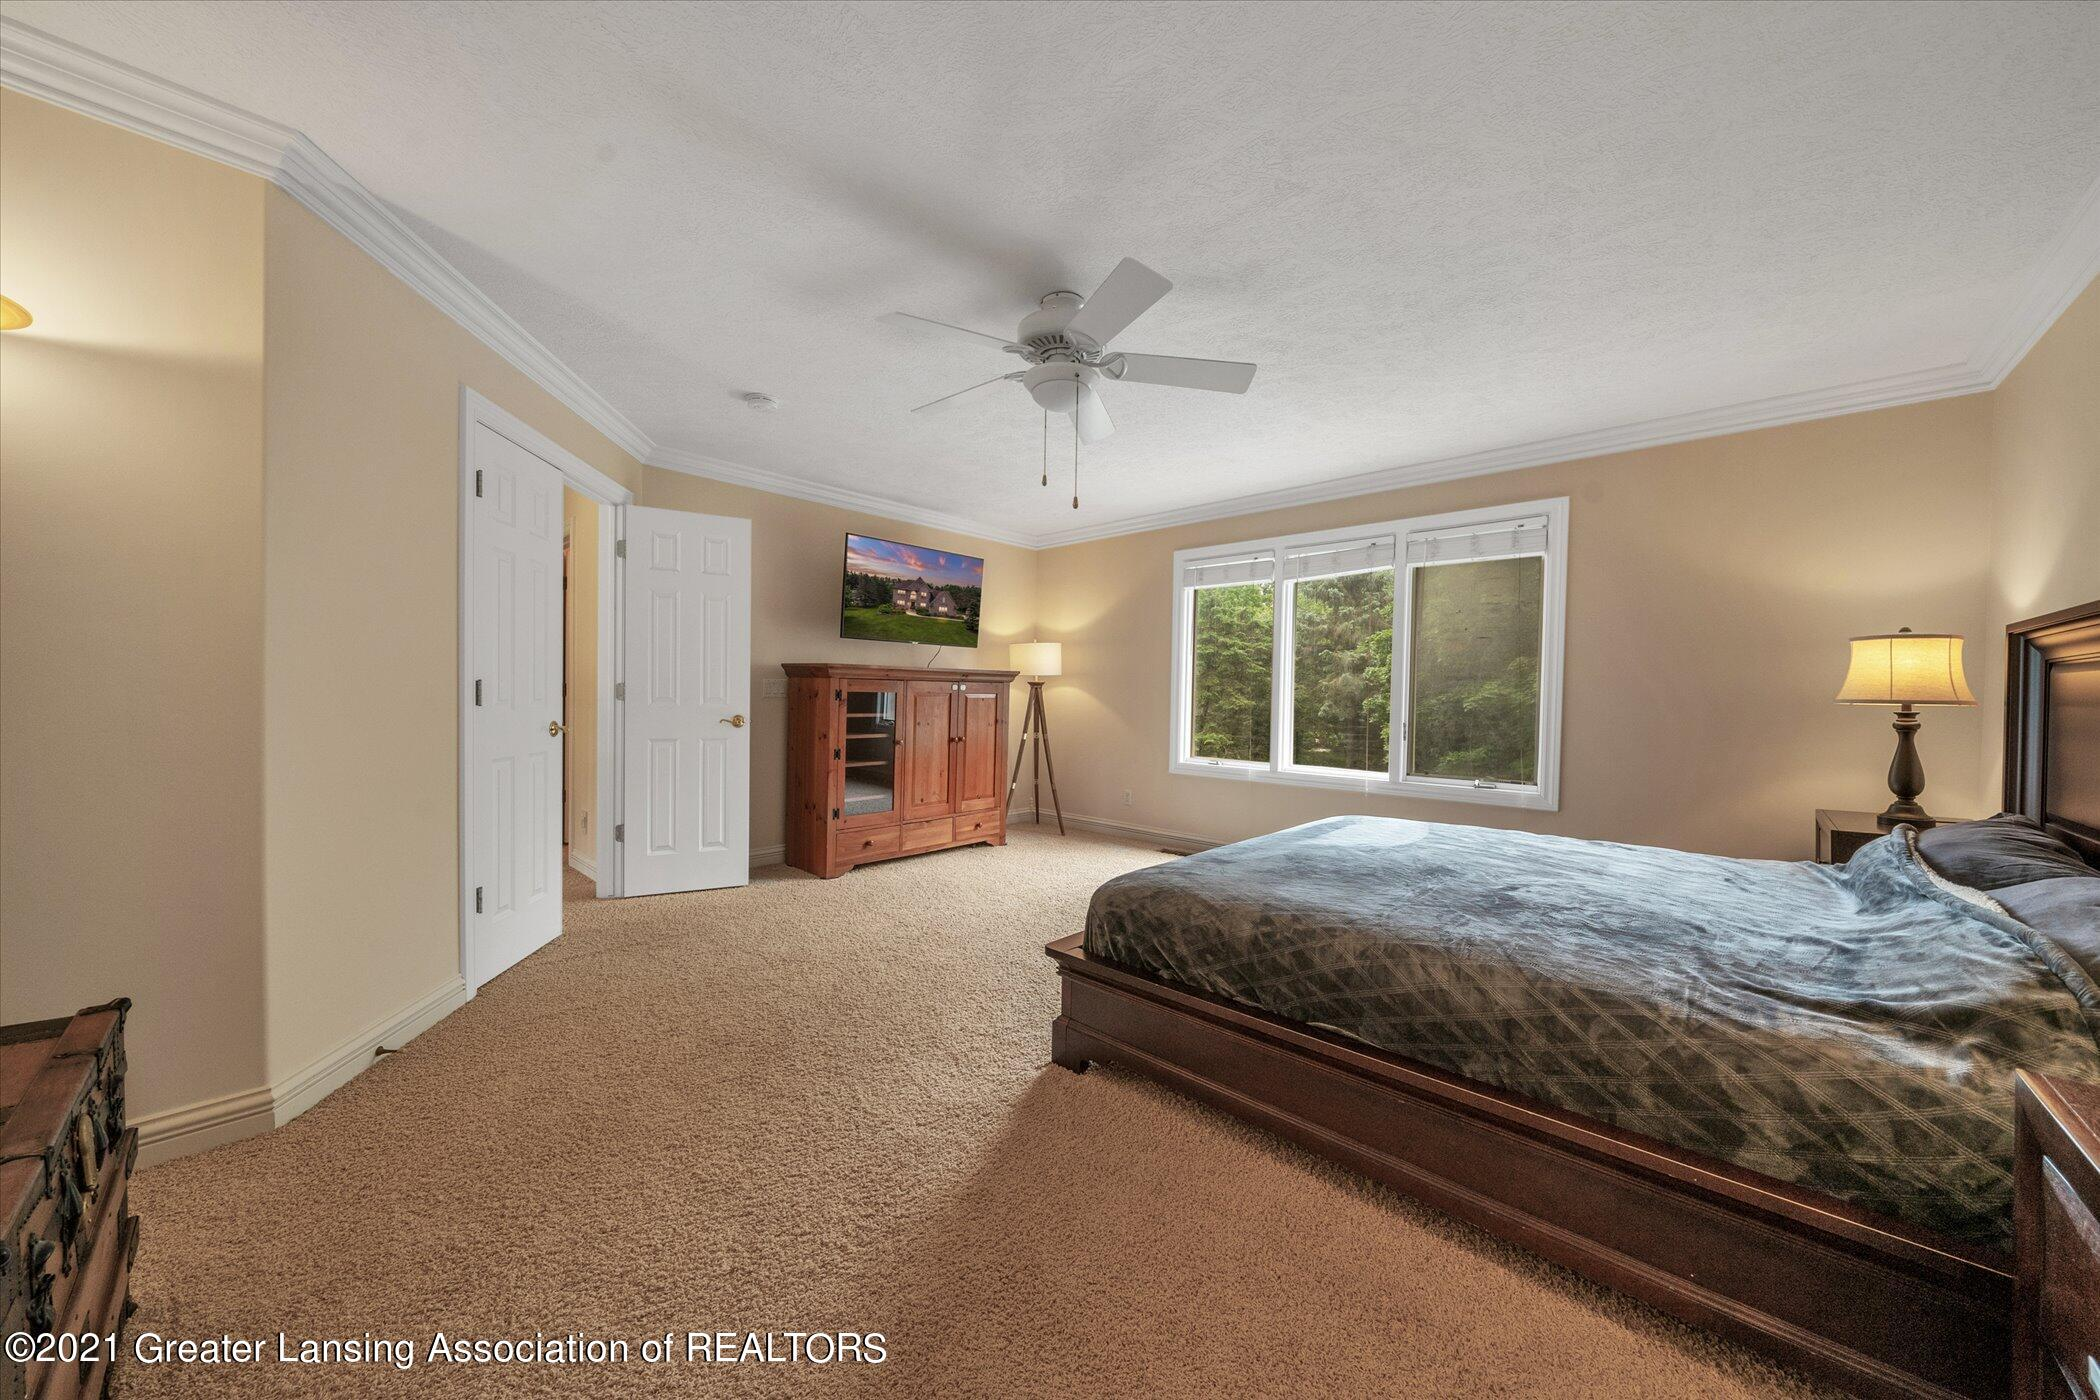 8100 Casandra Ln - UPPER LEVEL Primary Bedroom - 6